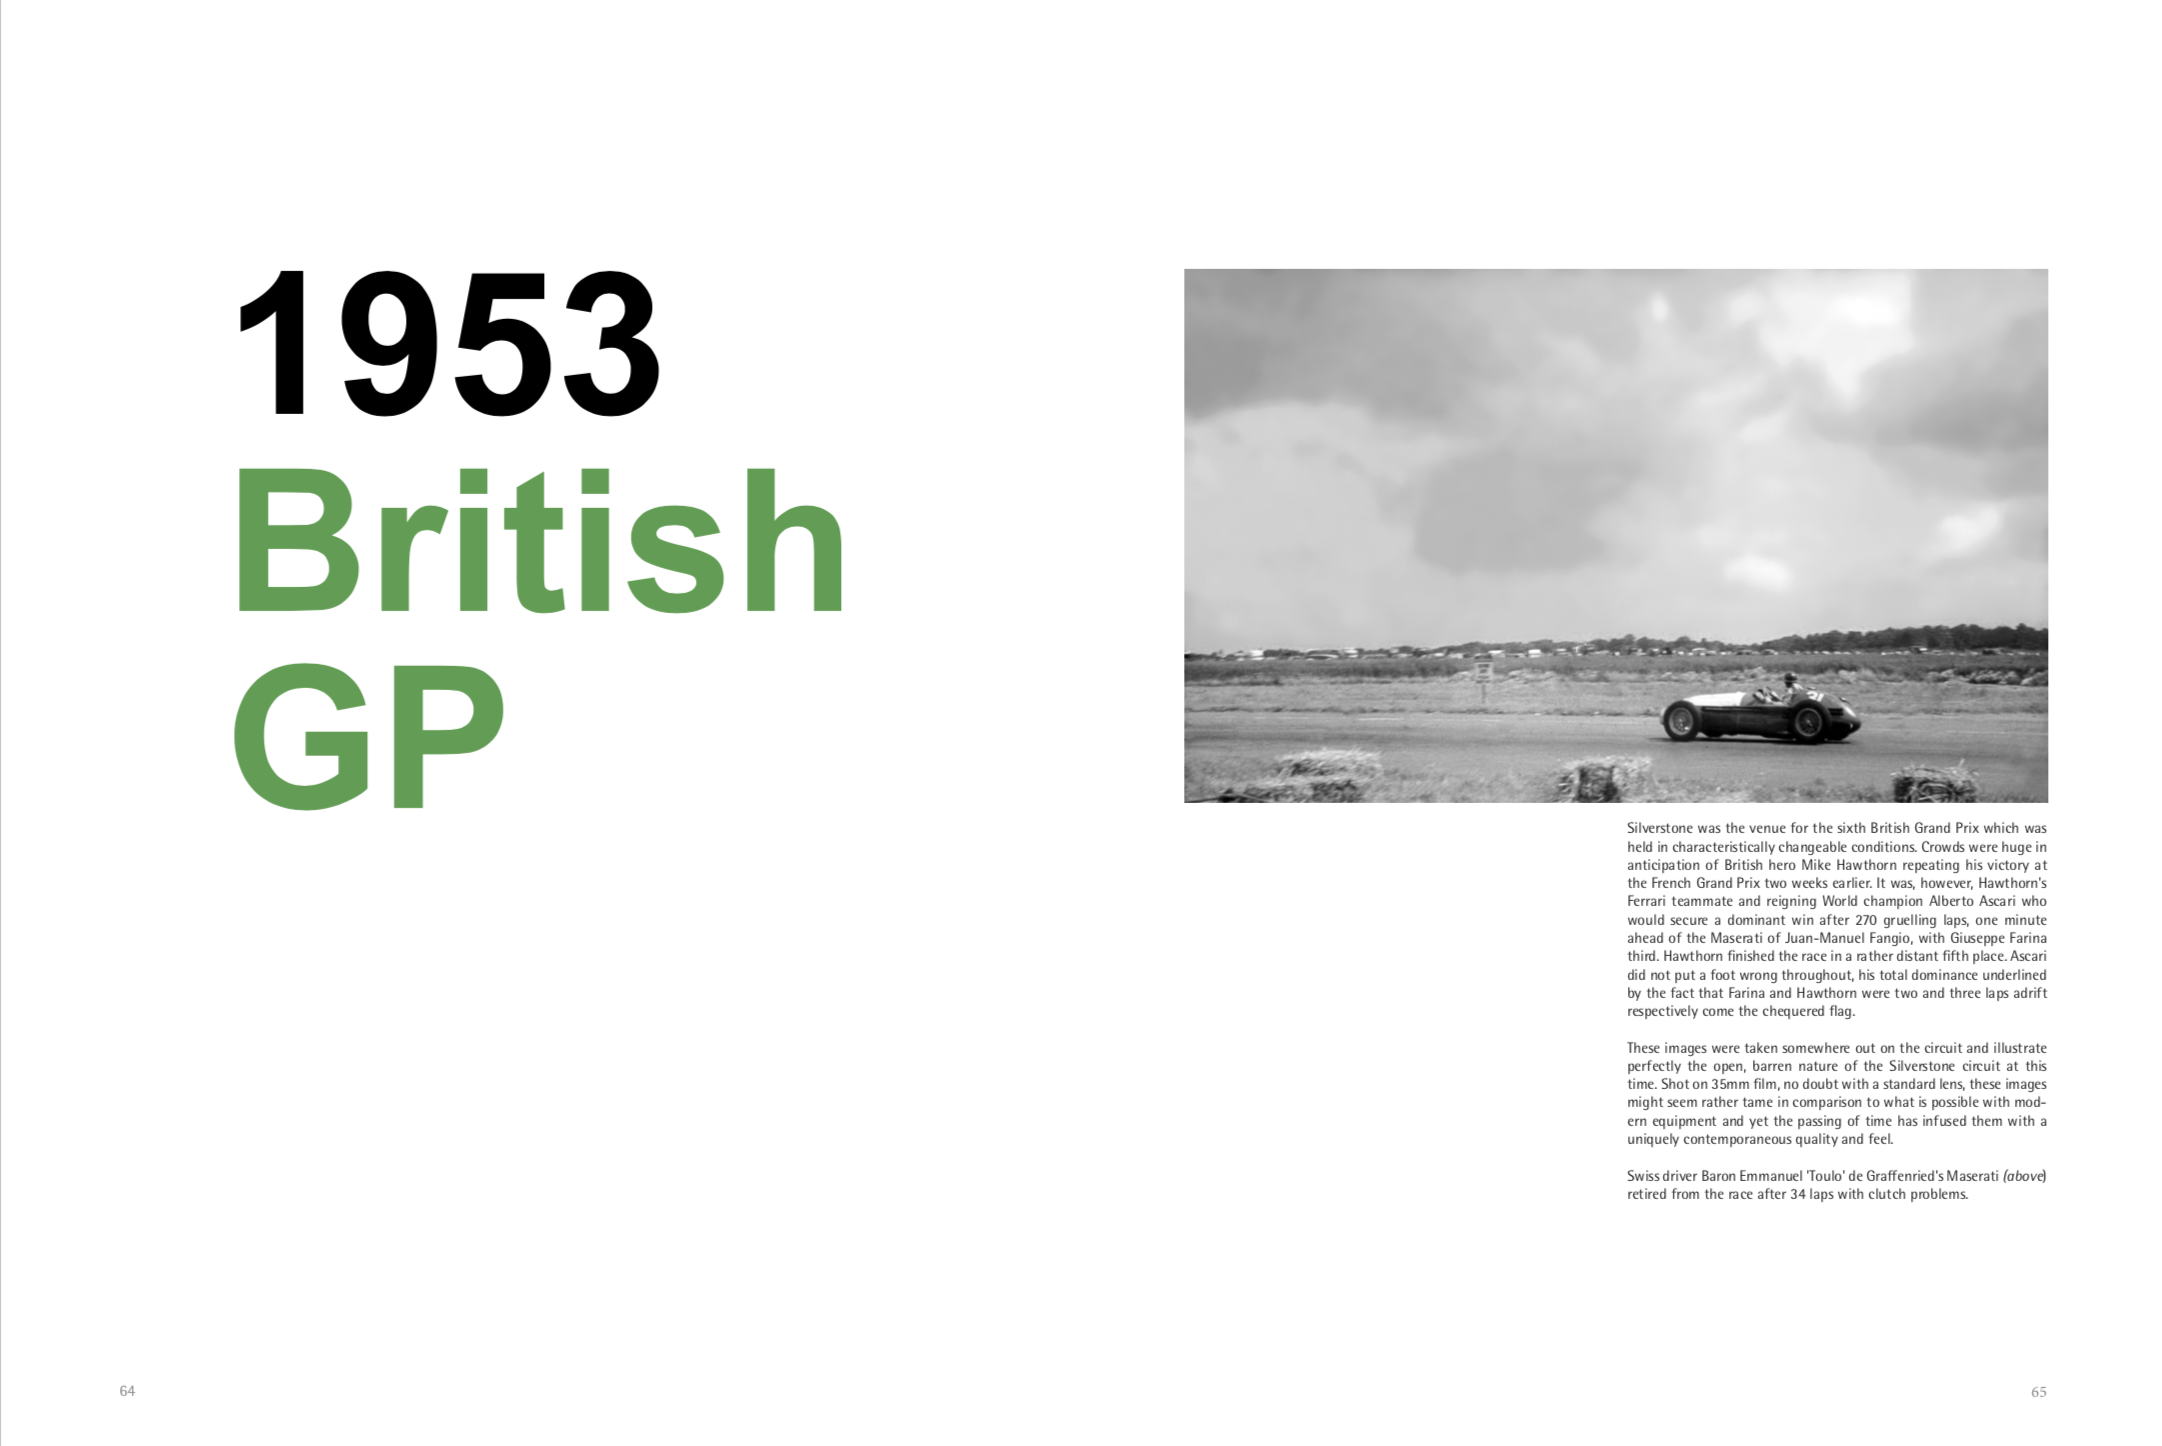 1953 British GP